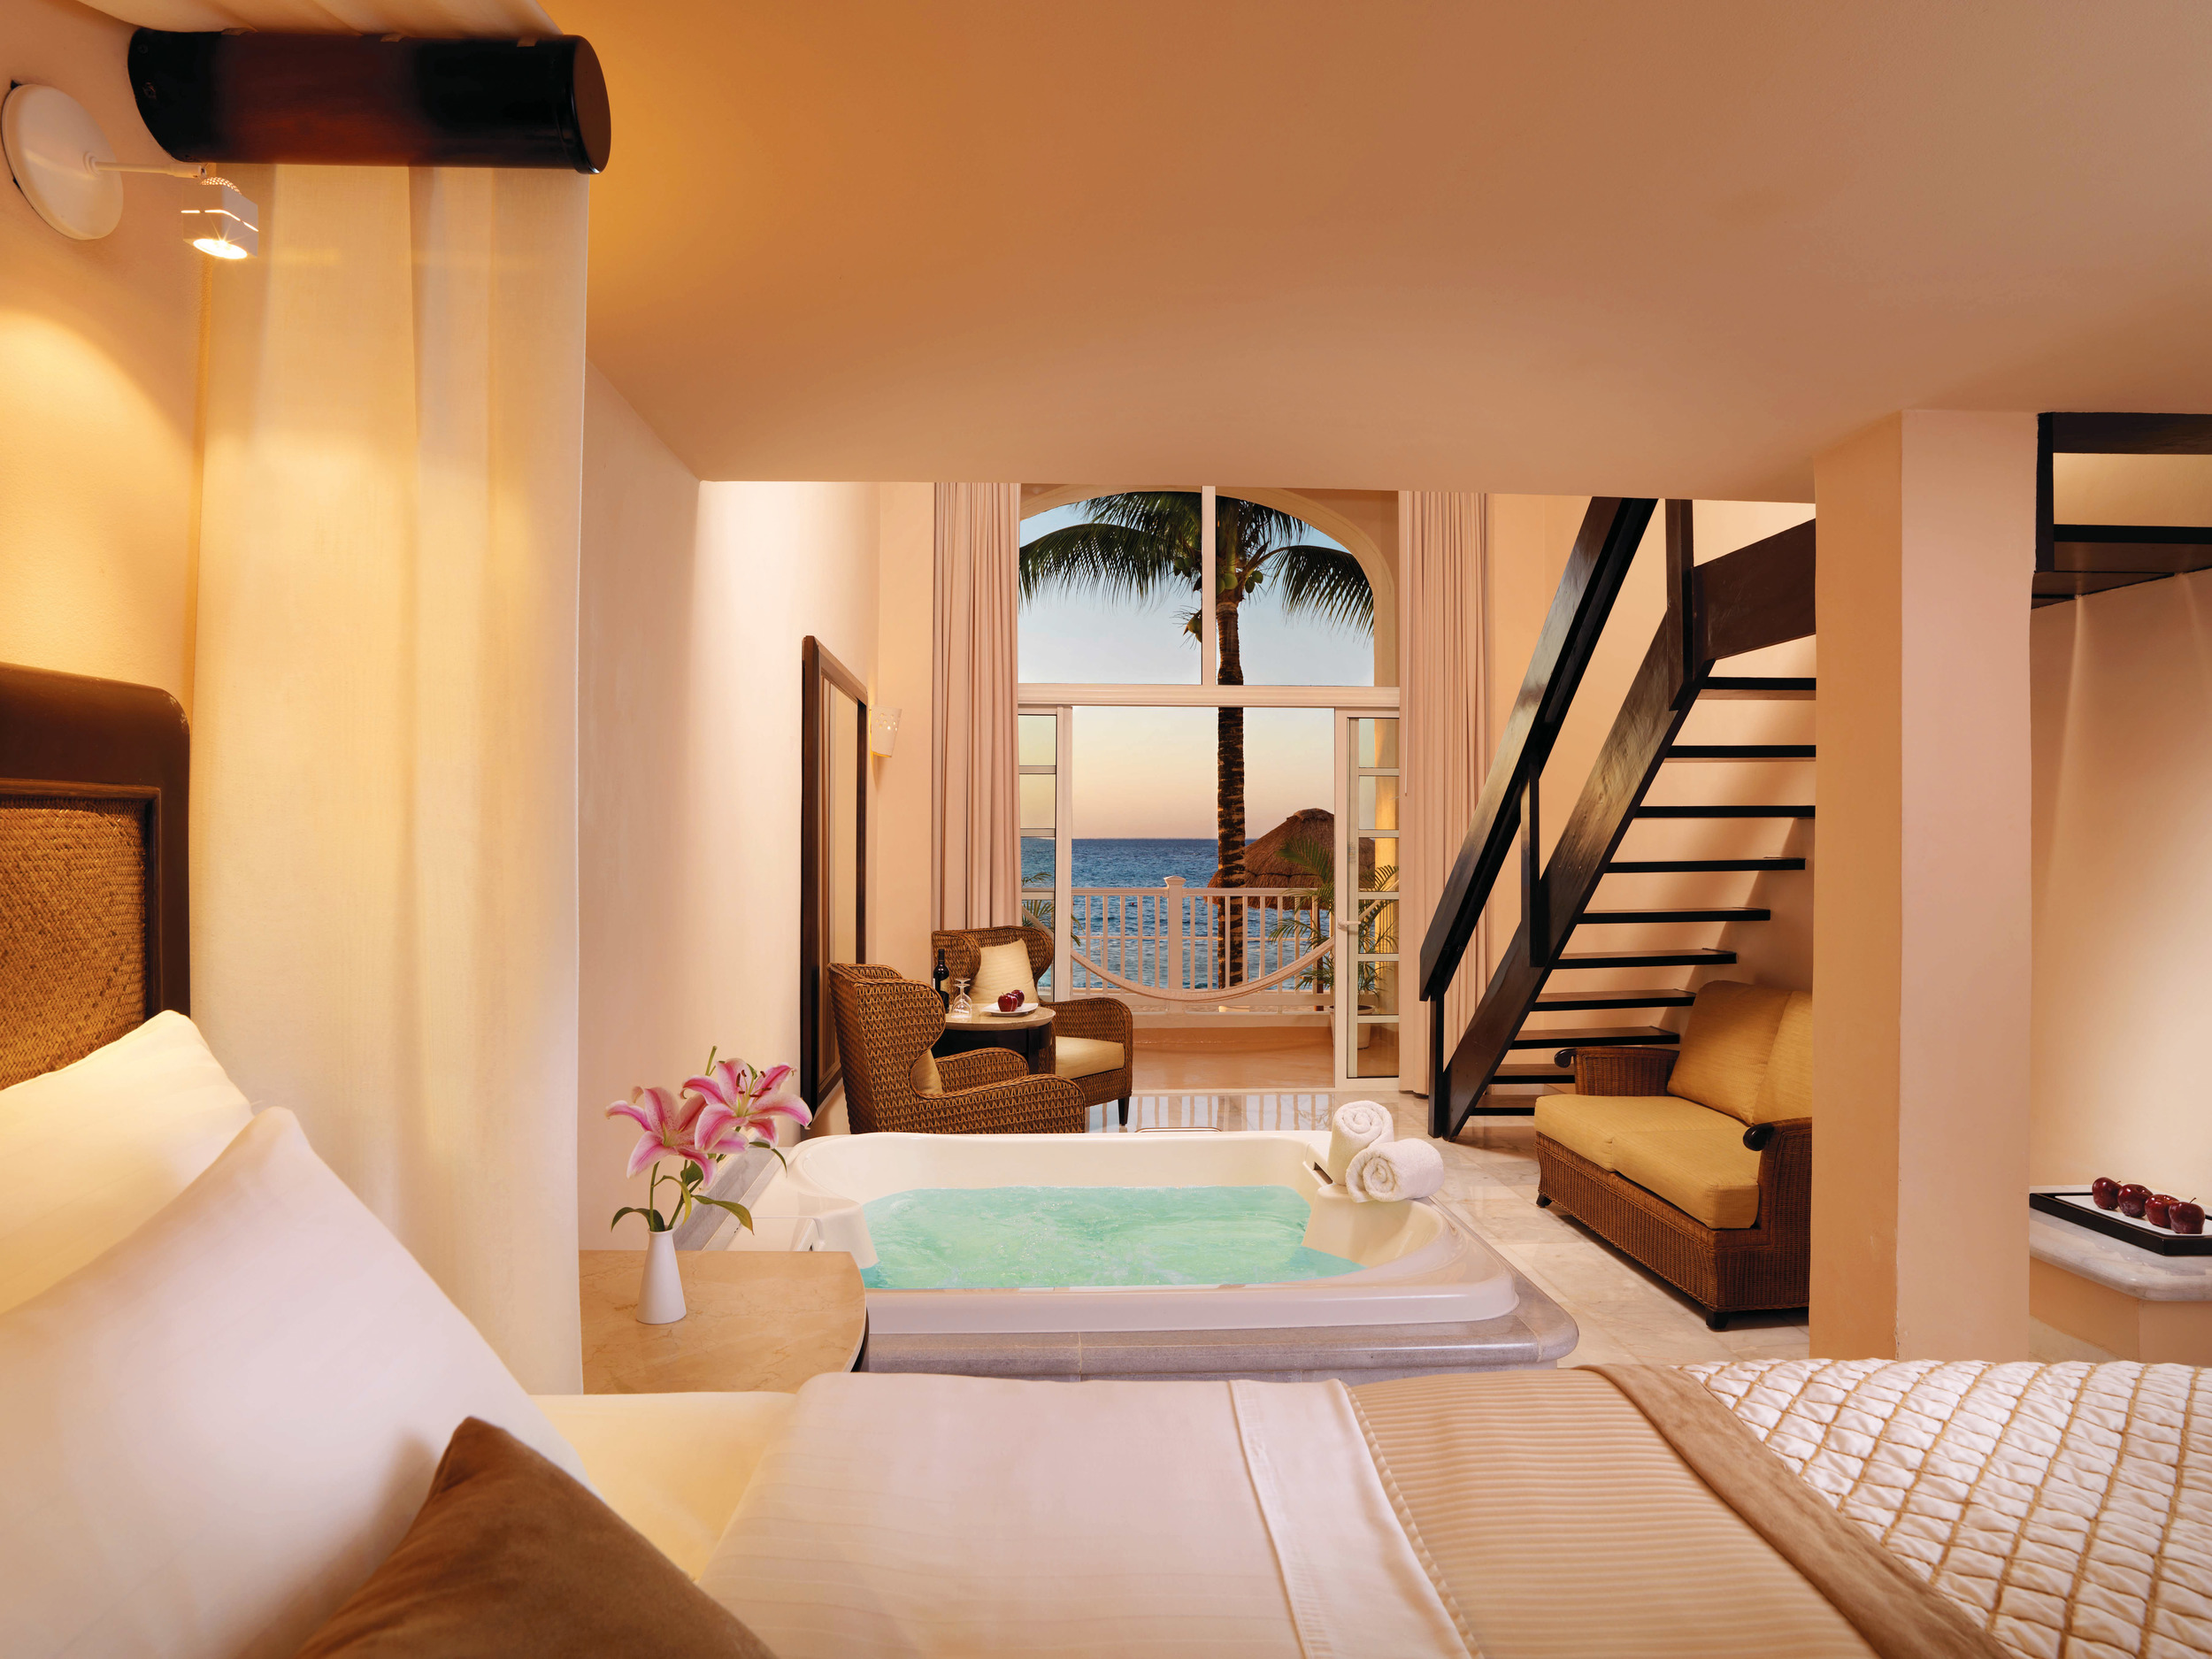 Image via   Palace Resorts